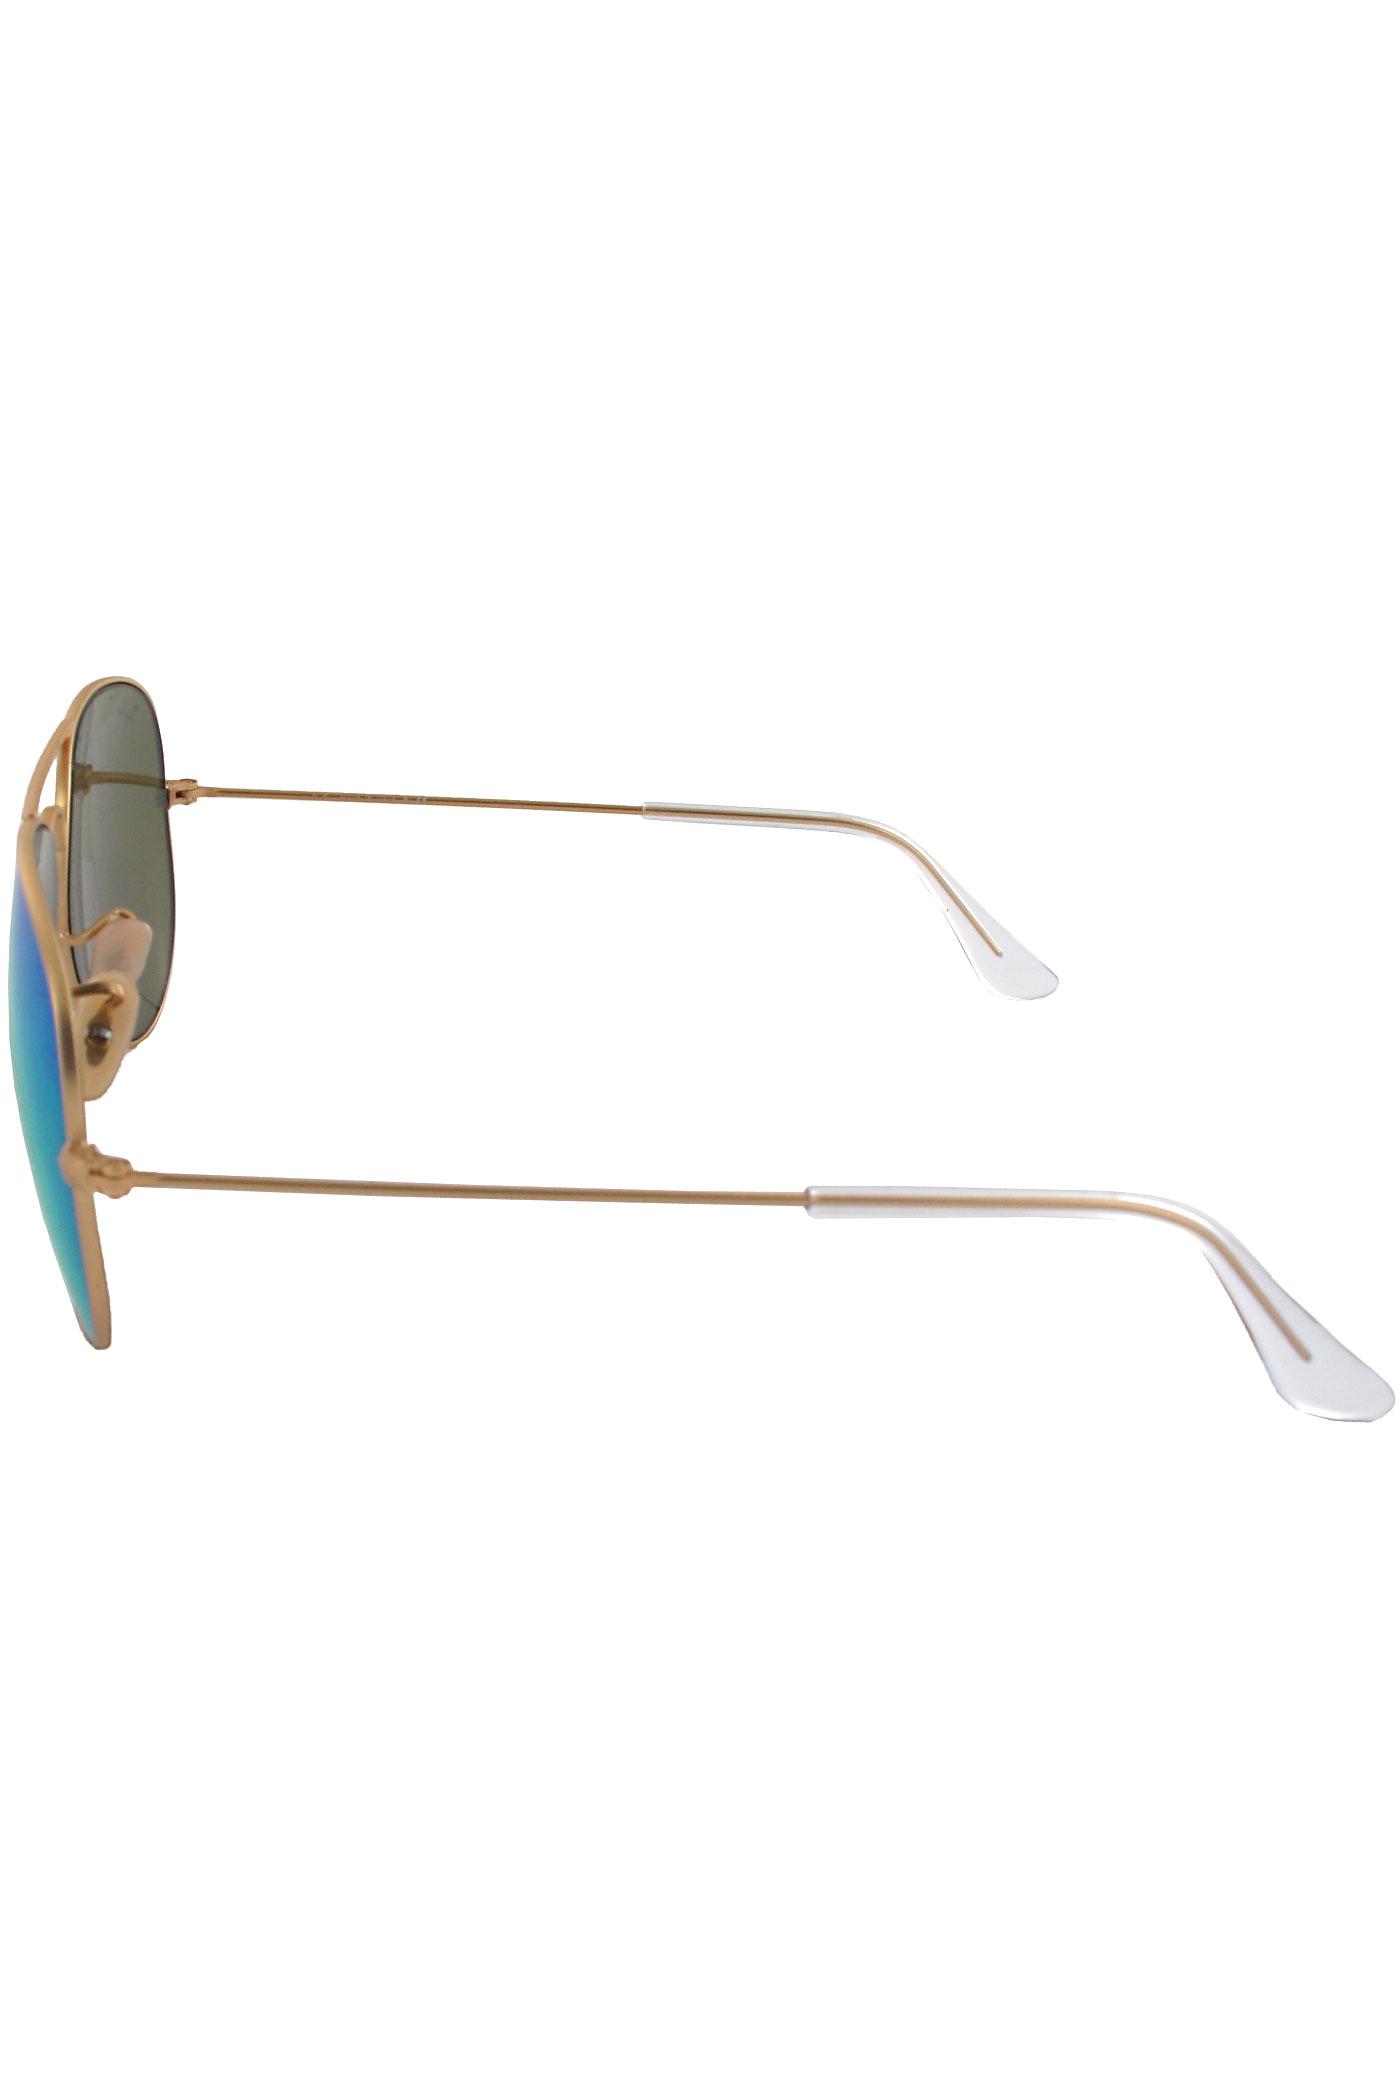 ray ban sunglasses gold 657c  ray ban sunglasses gold